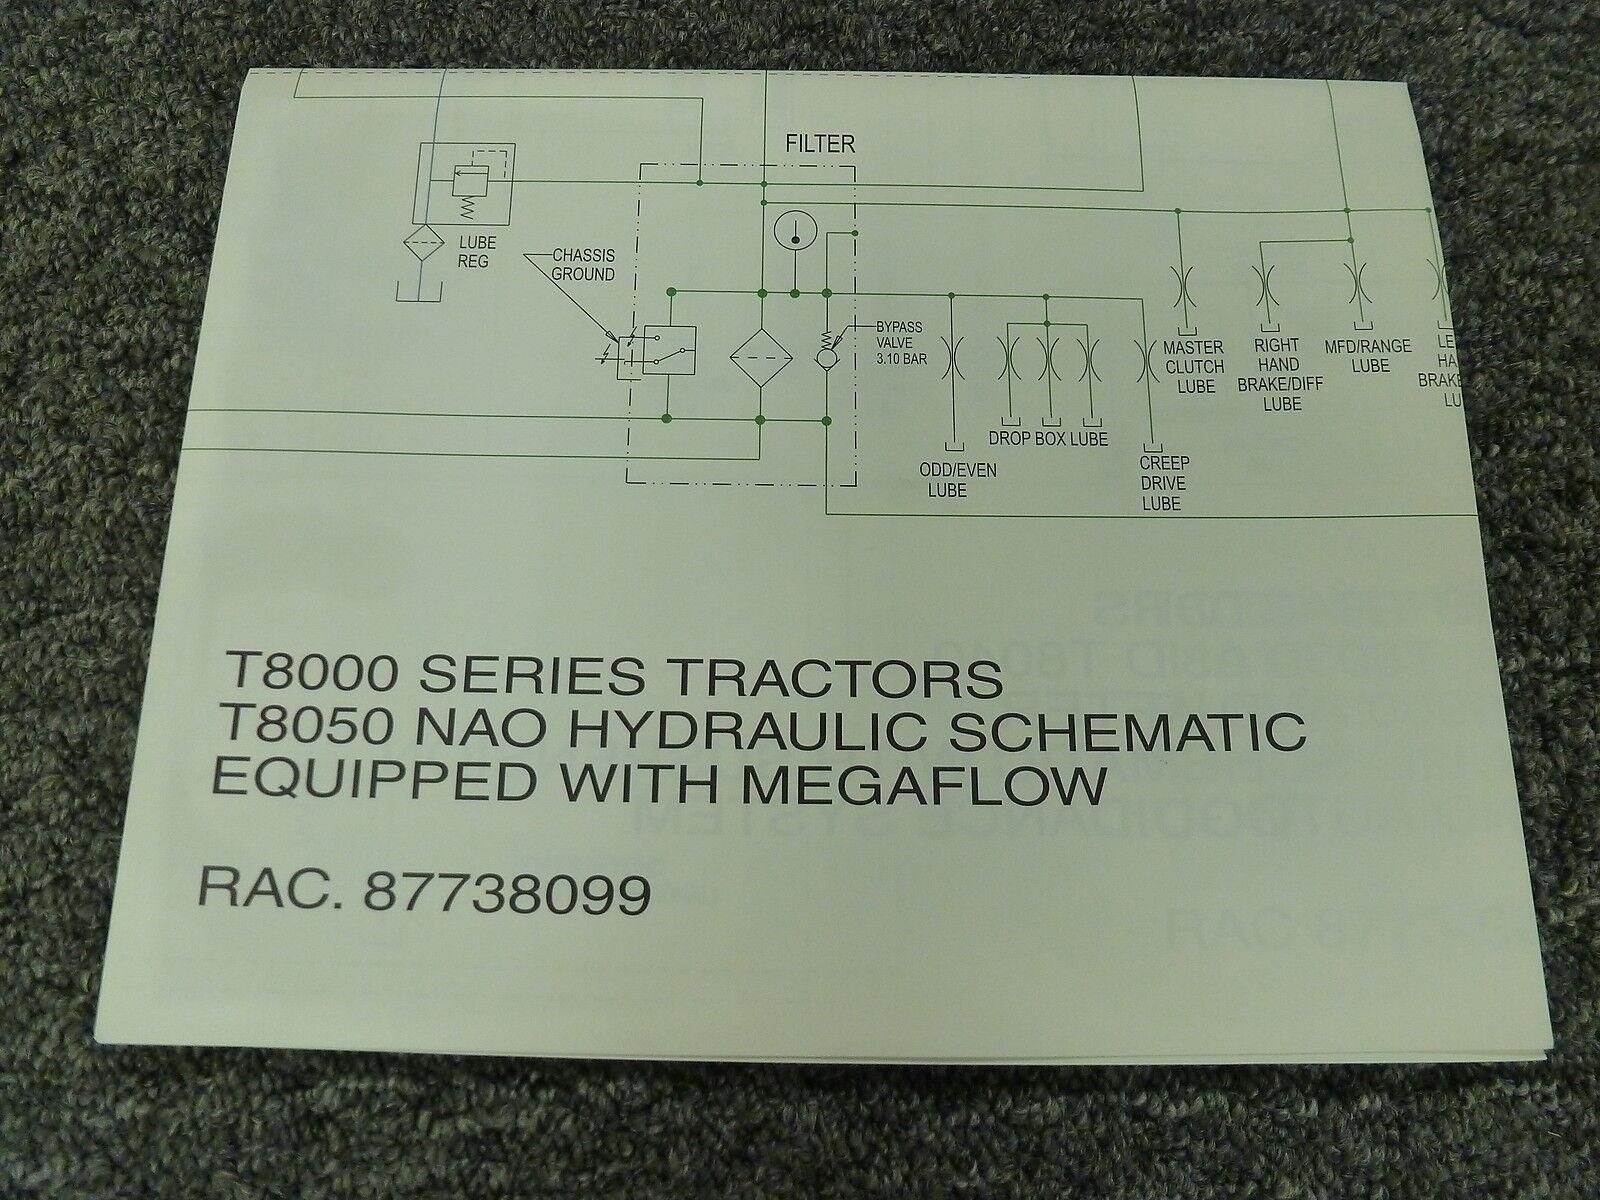 New Holland T8050 fila cultivo Tractor Nao hidráulico hidráulico hidráulico Manual de diagrama esquemático 720be0